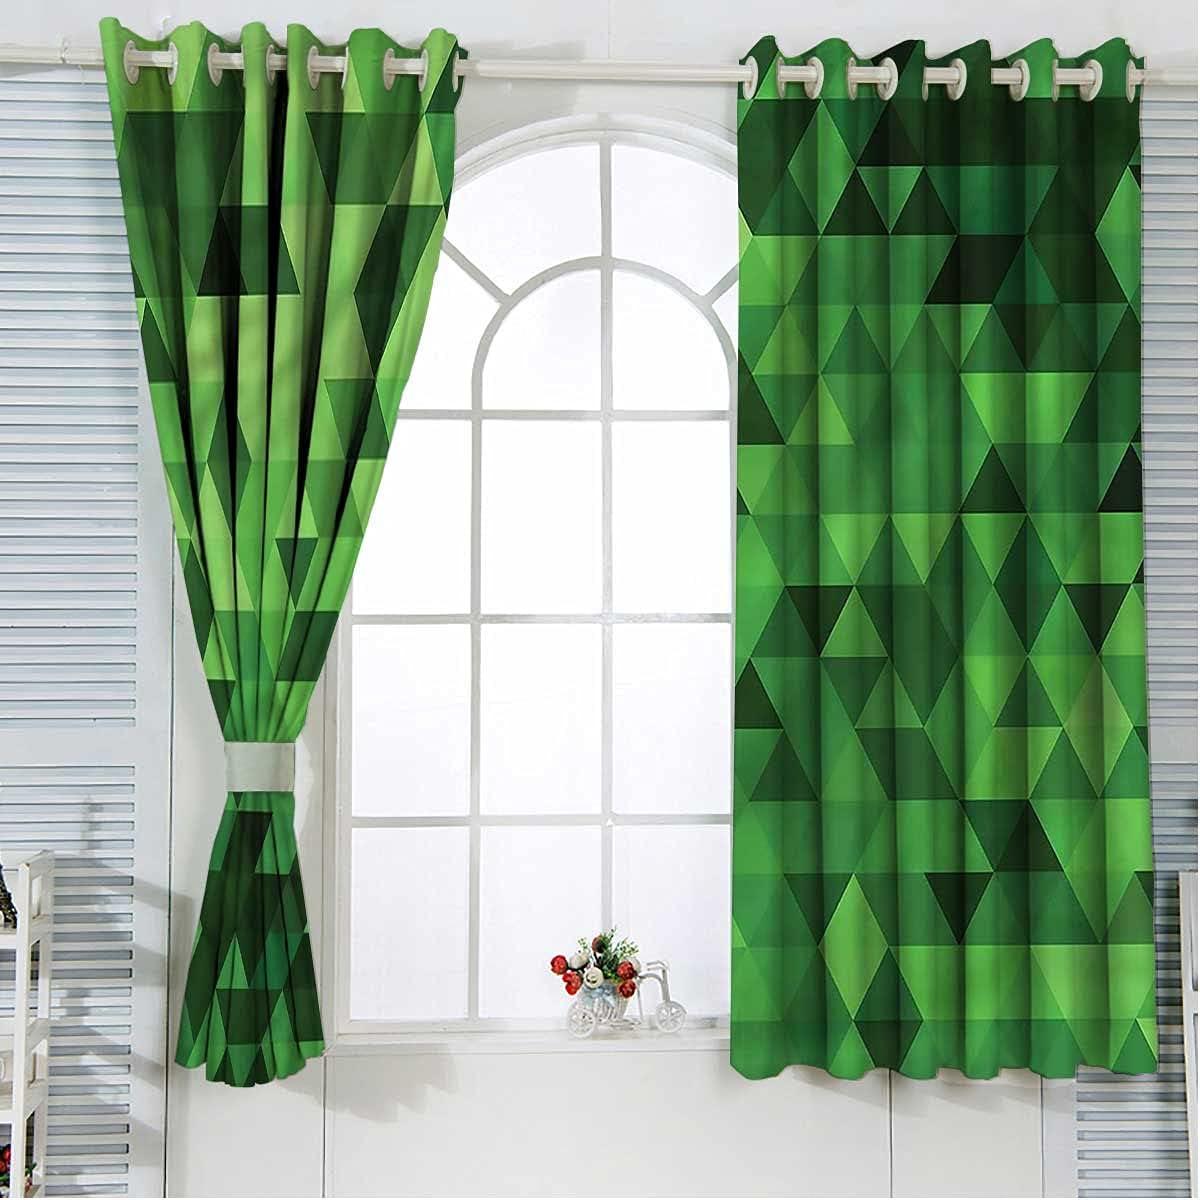 Jade Green Blackout Curtain Panels 2 Albuquerque Mall 108 SALENEW very popular! Inch Polygon Length Set